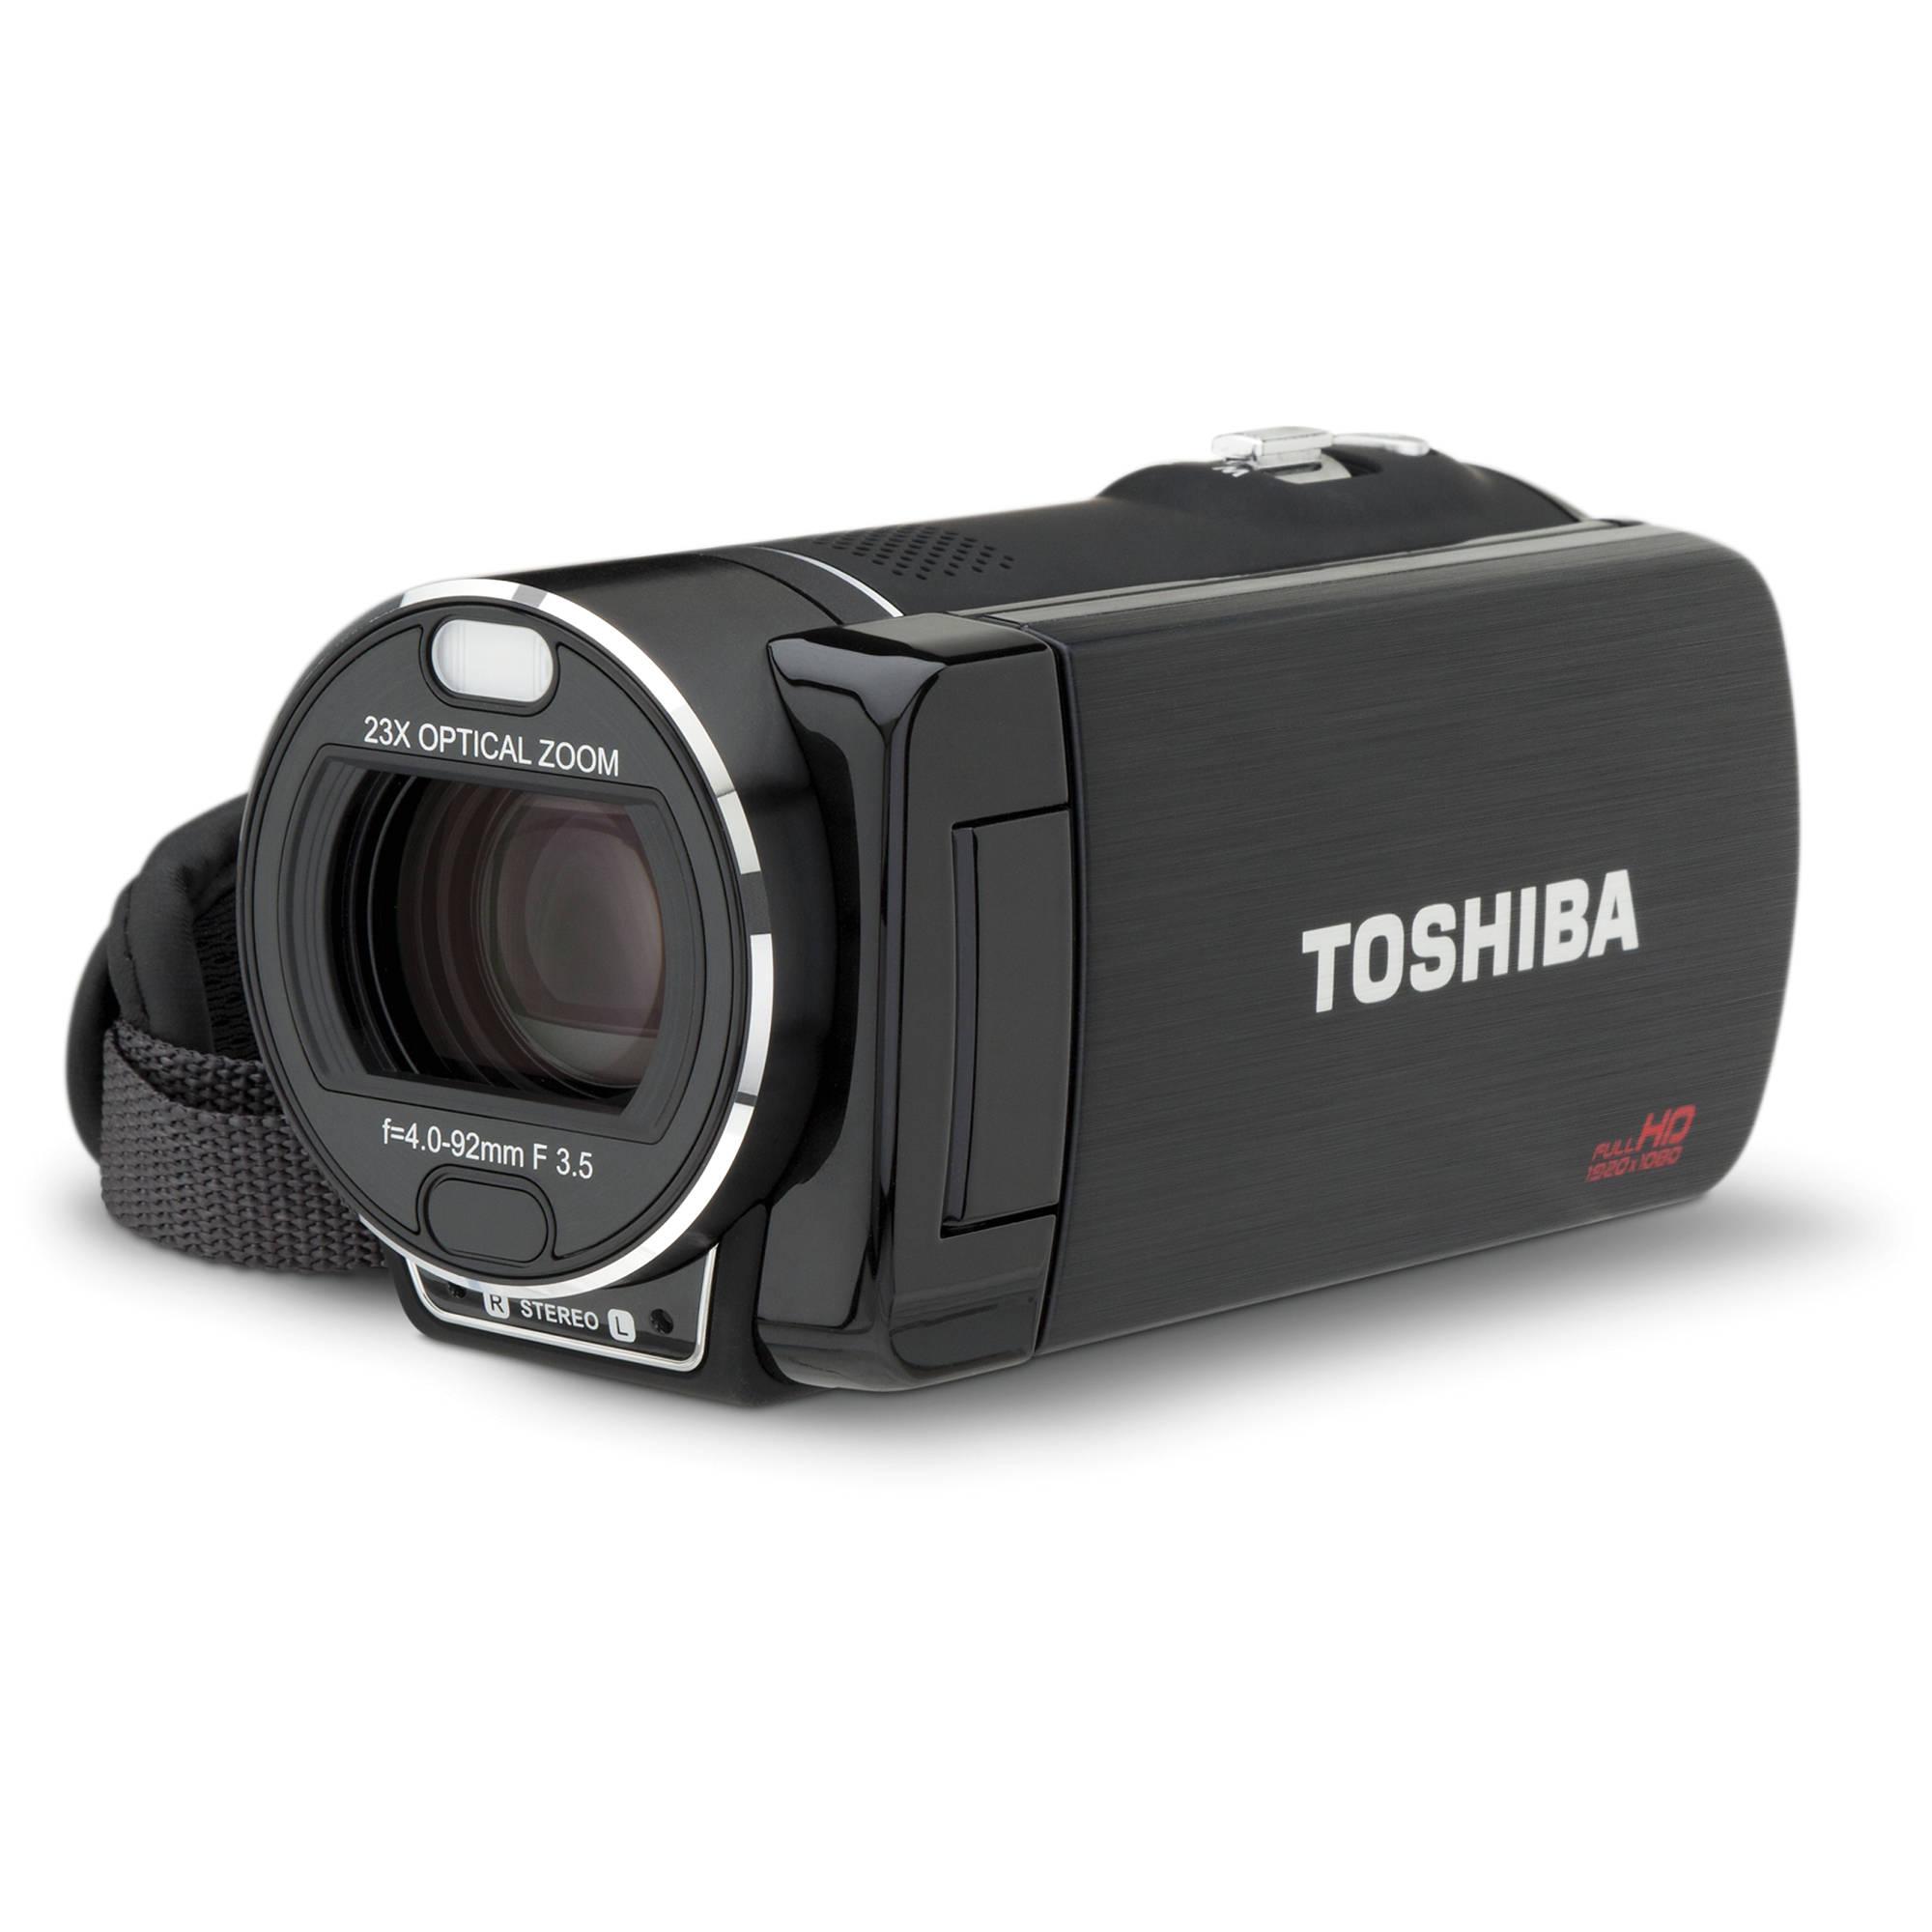 toshiba camileo x400 1080p hd camcorder pa3974u 1c0k b h photo rh bhphotovideo com Toshiba Camileo X100 Toshiba Camileo X100